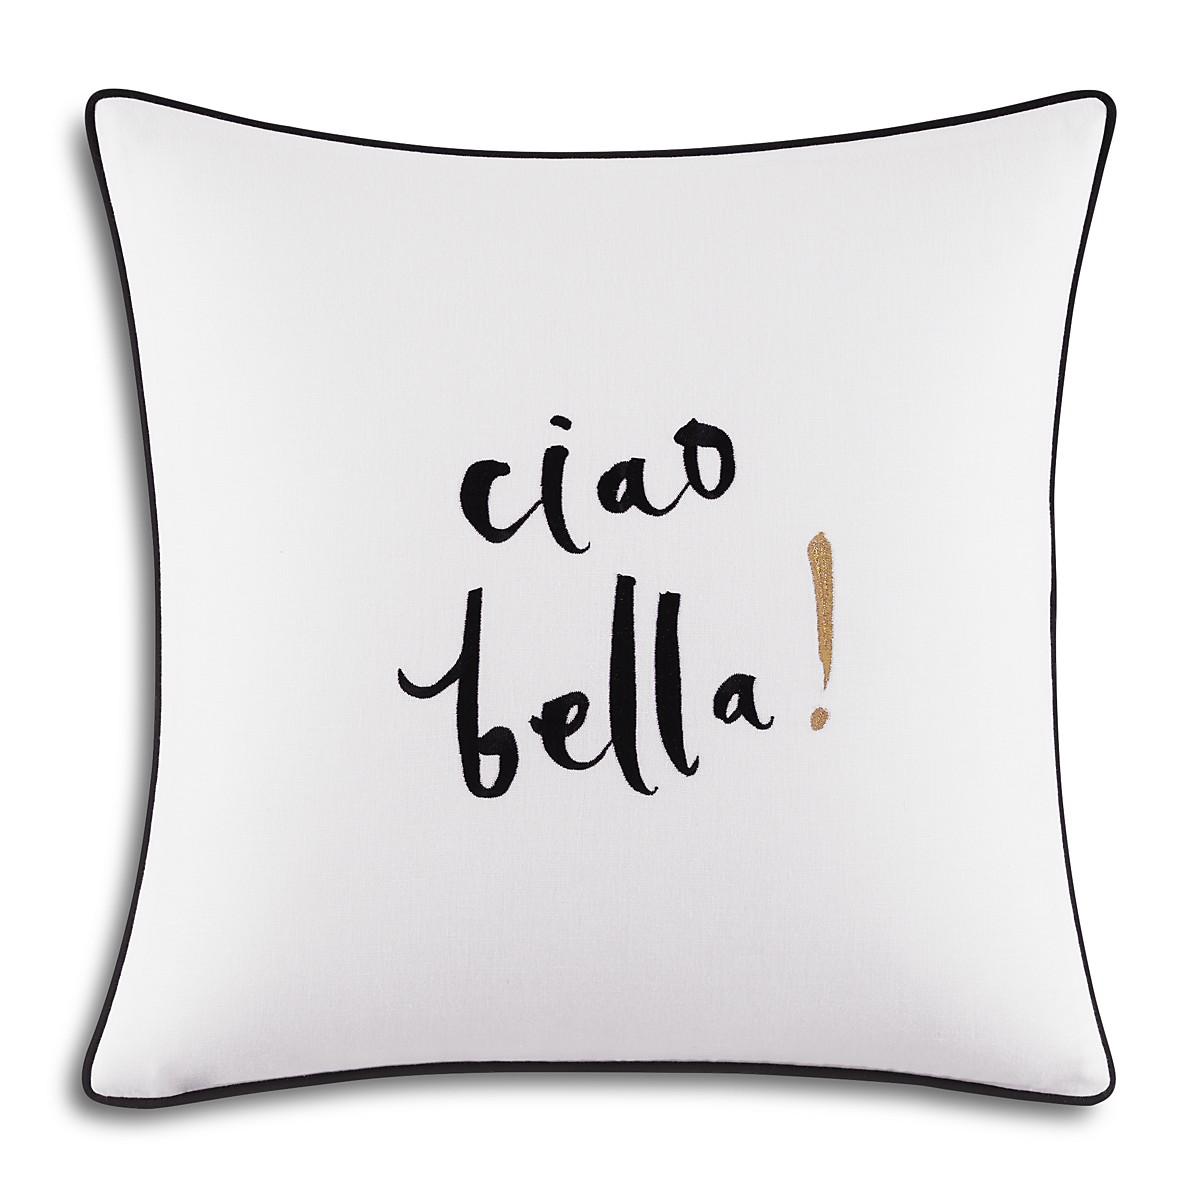 luxury kate spade pillows for pillow